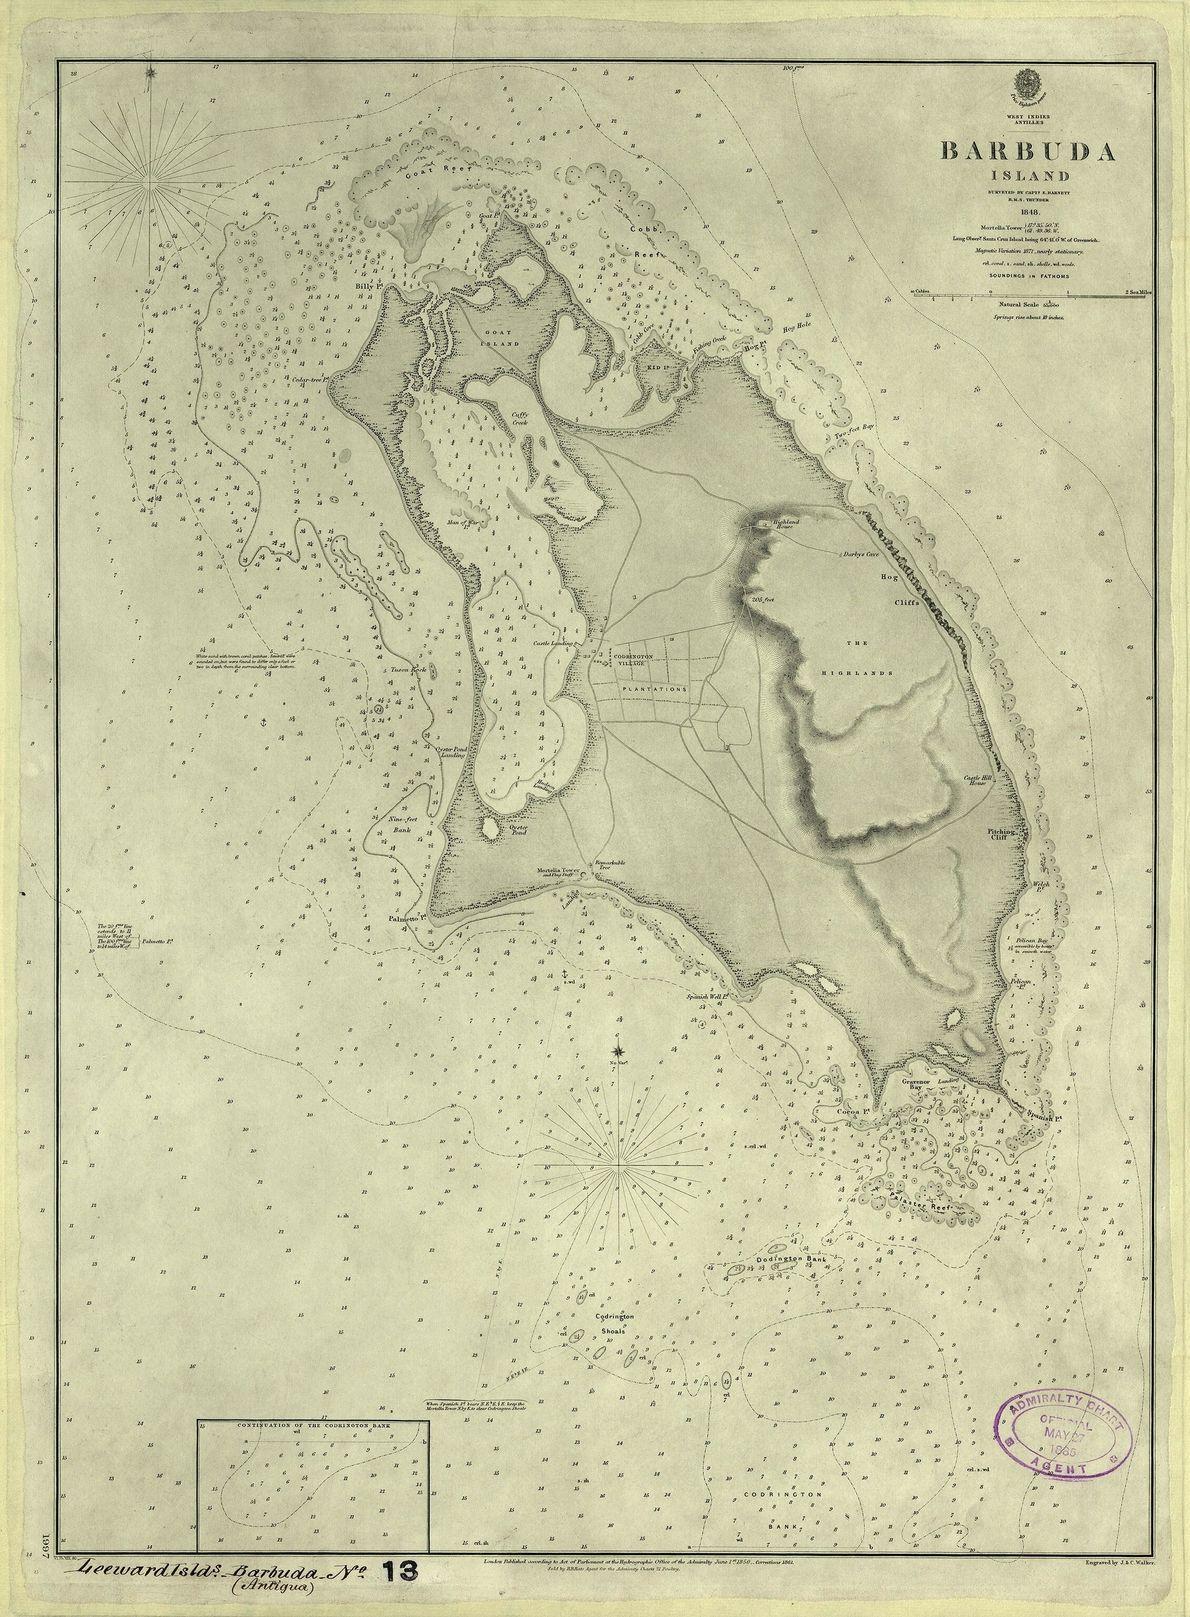 Historical map of Barbuda